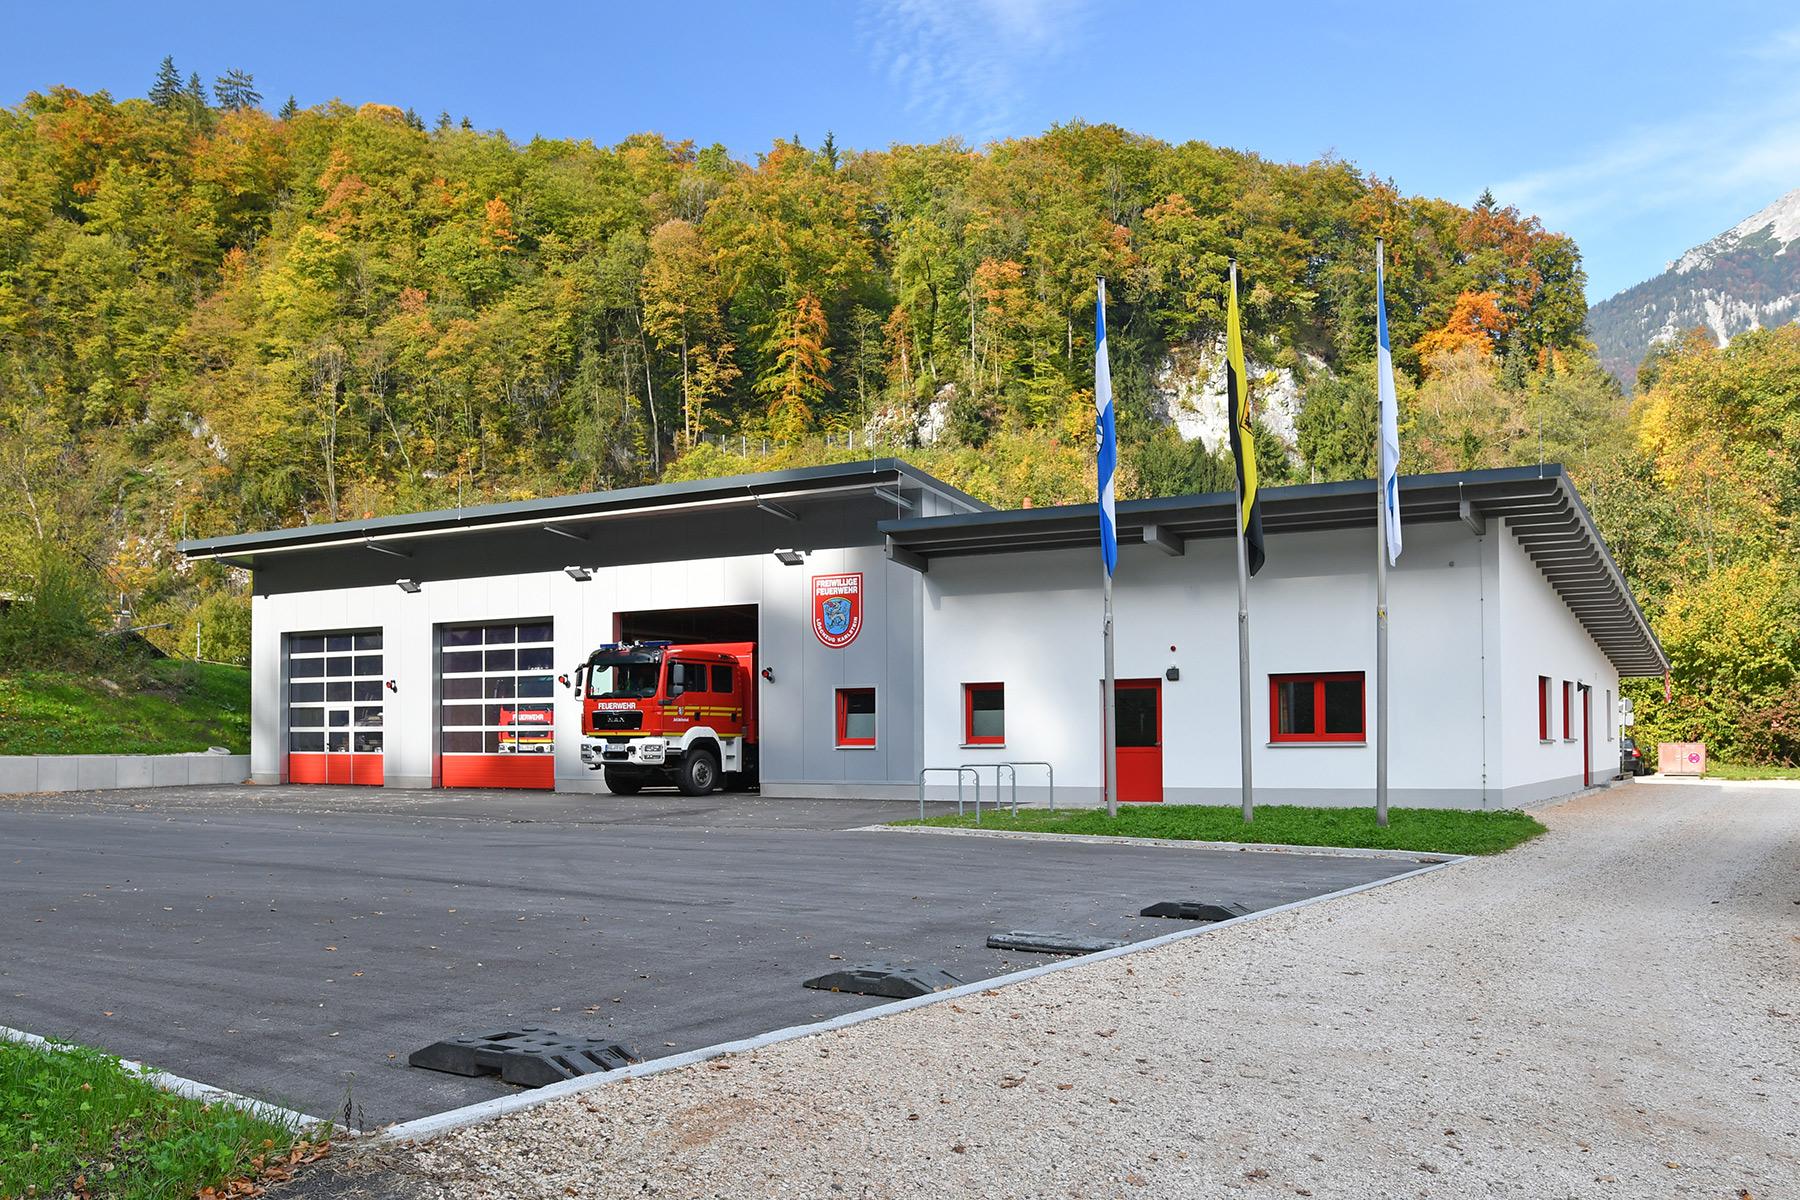 Feuerwehrgebäude